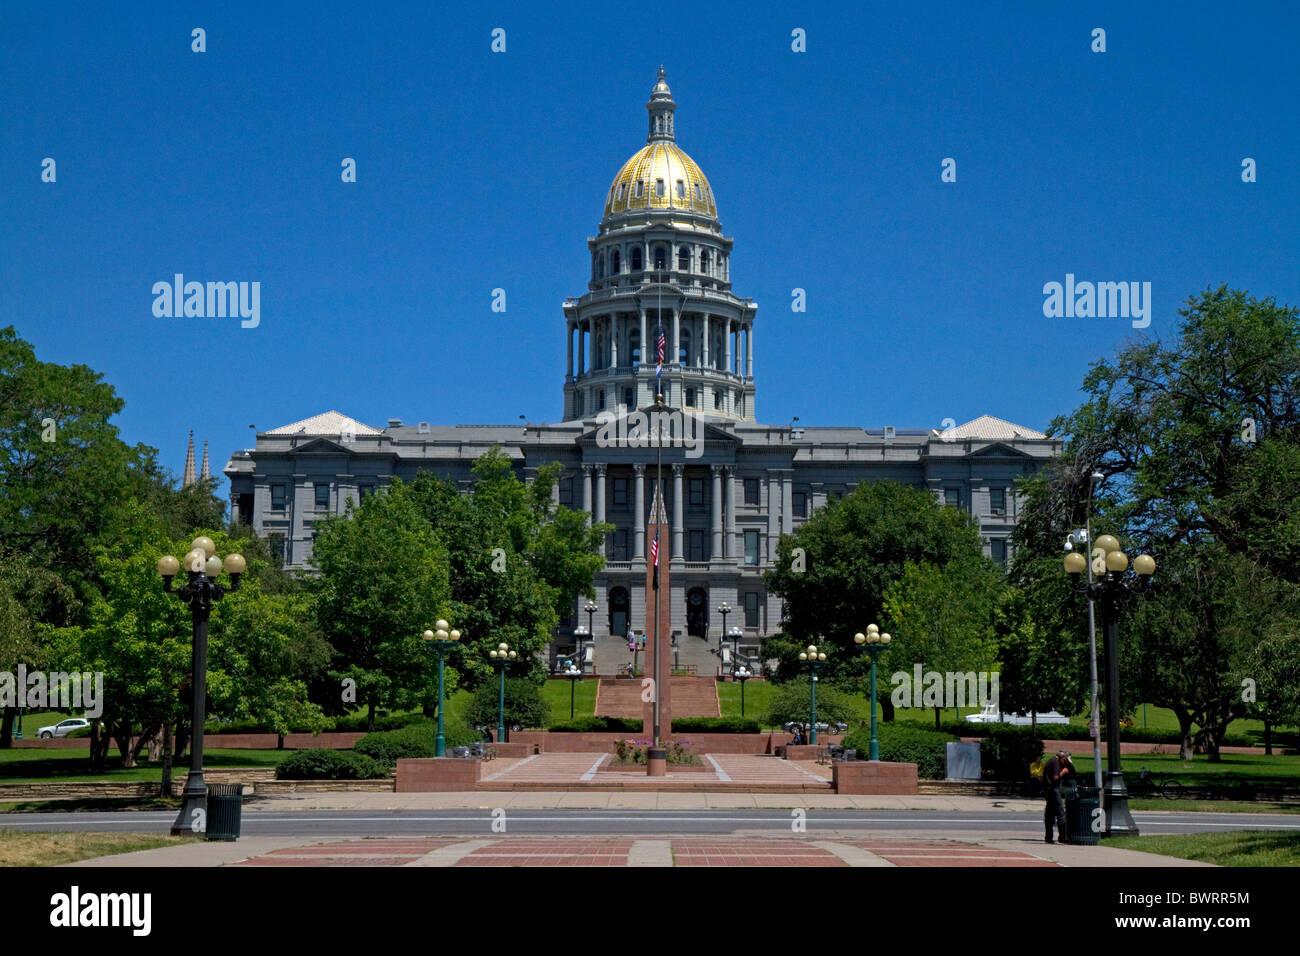 The Colorado State Capitol Building located in Denver, Colorado, USA. - Stock Image